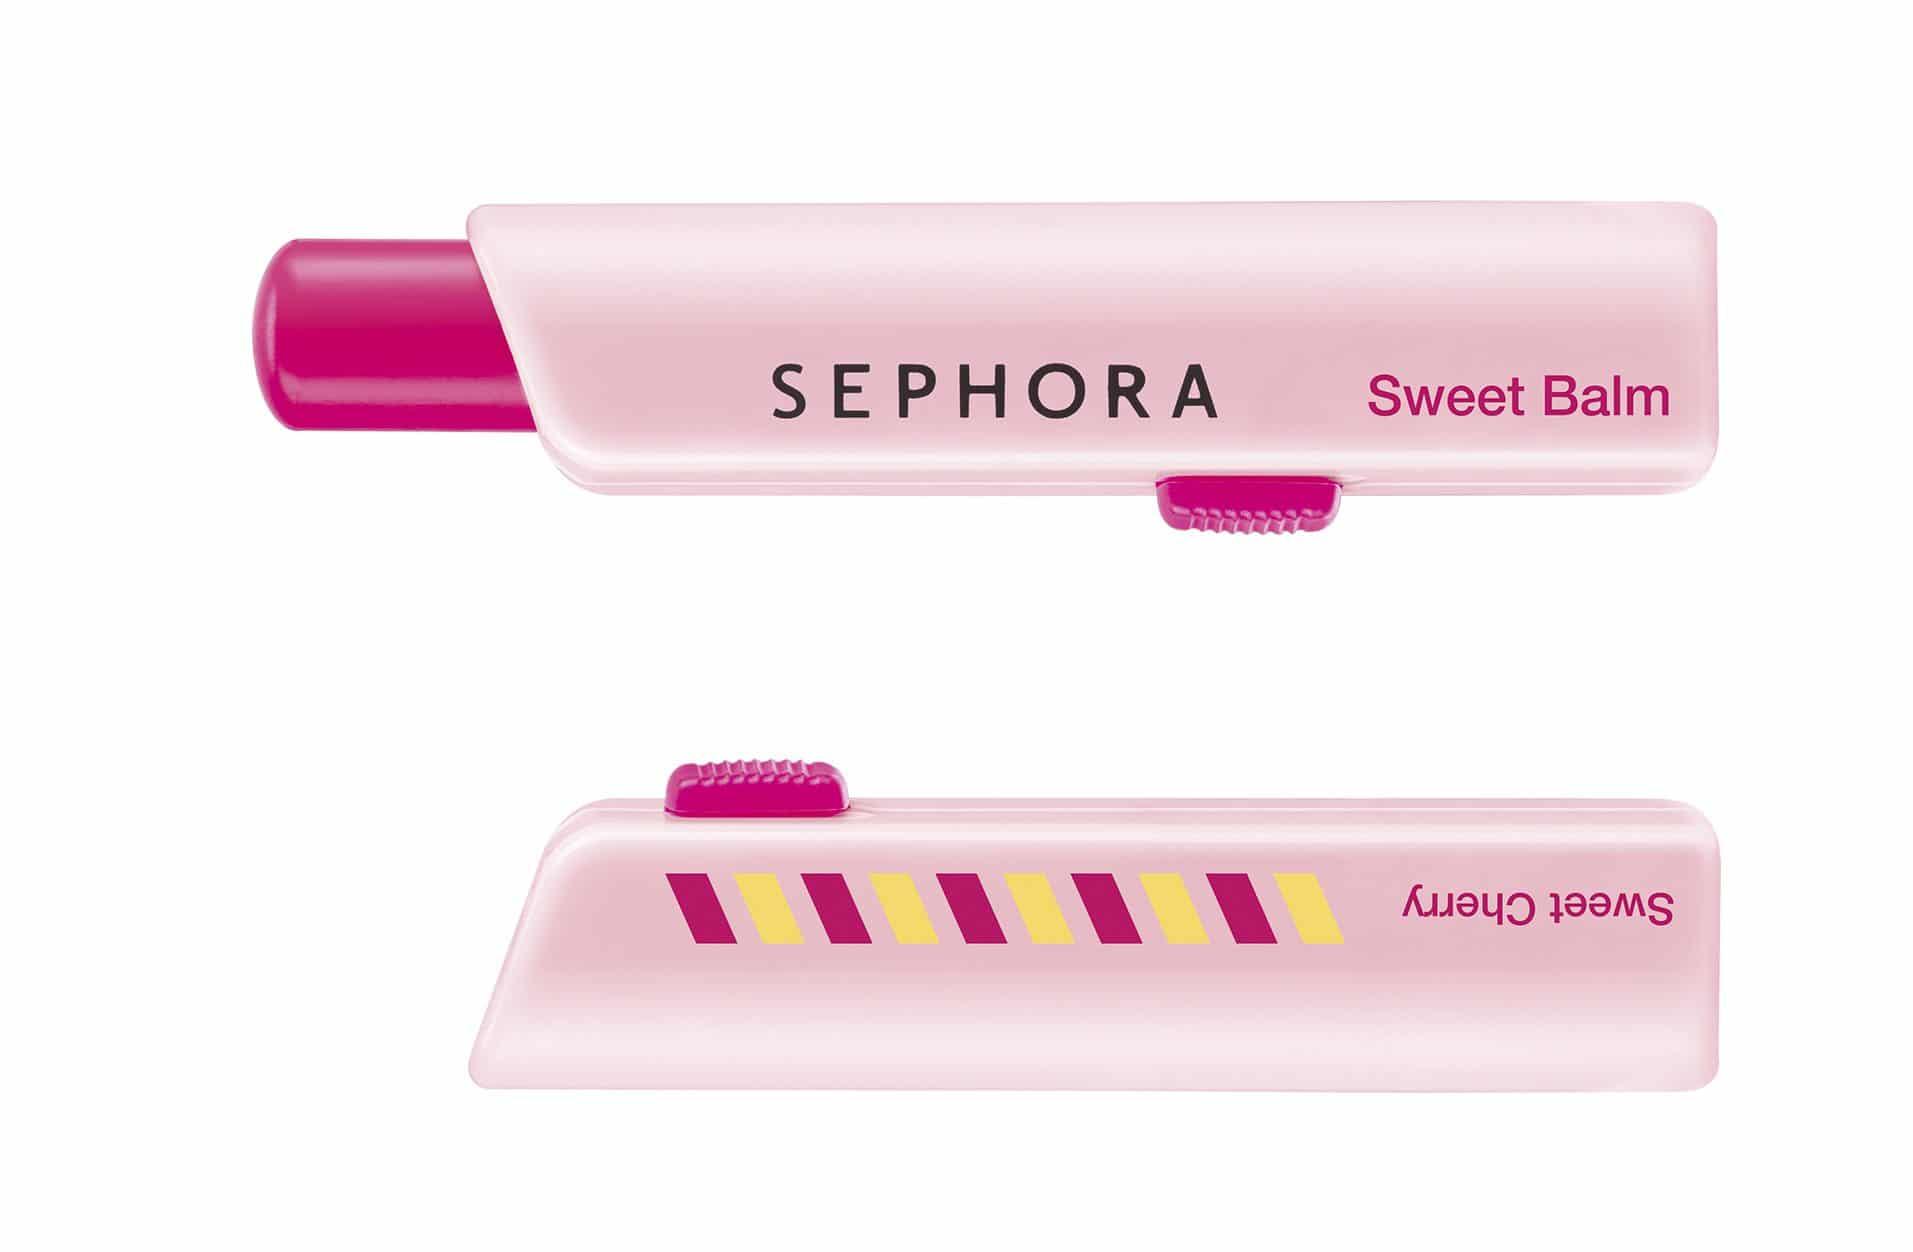 Sephora, tutte le novità primavera-estate 2017 - Beauty To Go - Balsami labbra Sweet Balm